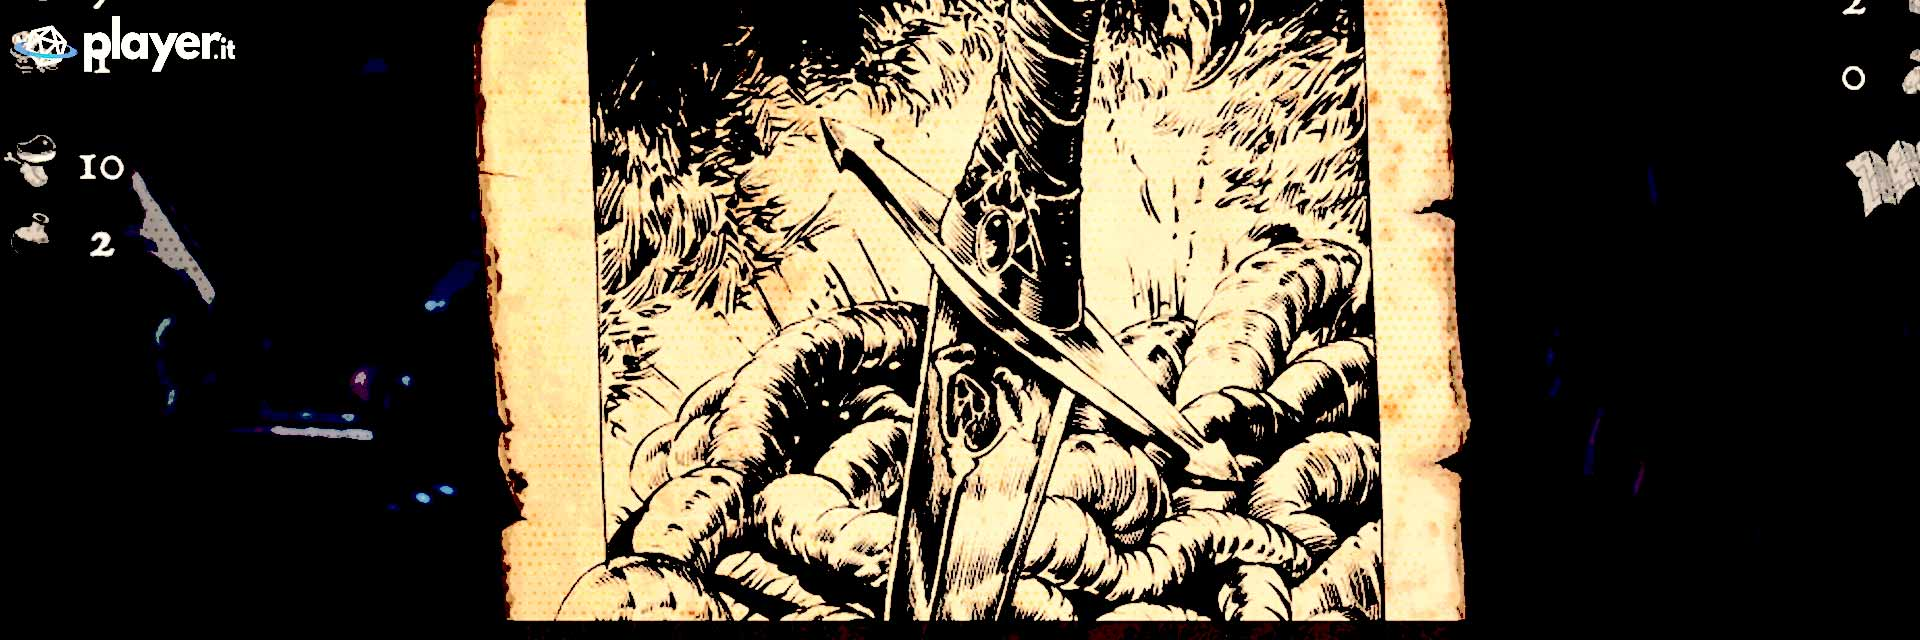 Deathrap Dungeon: The interactive video adventure wallpaper